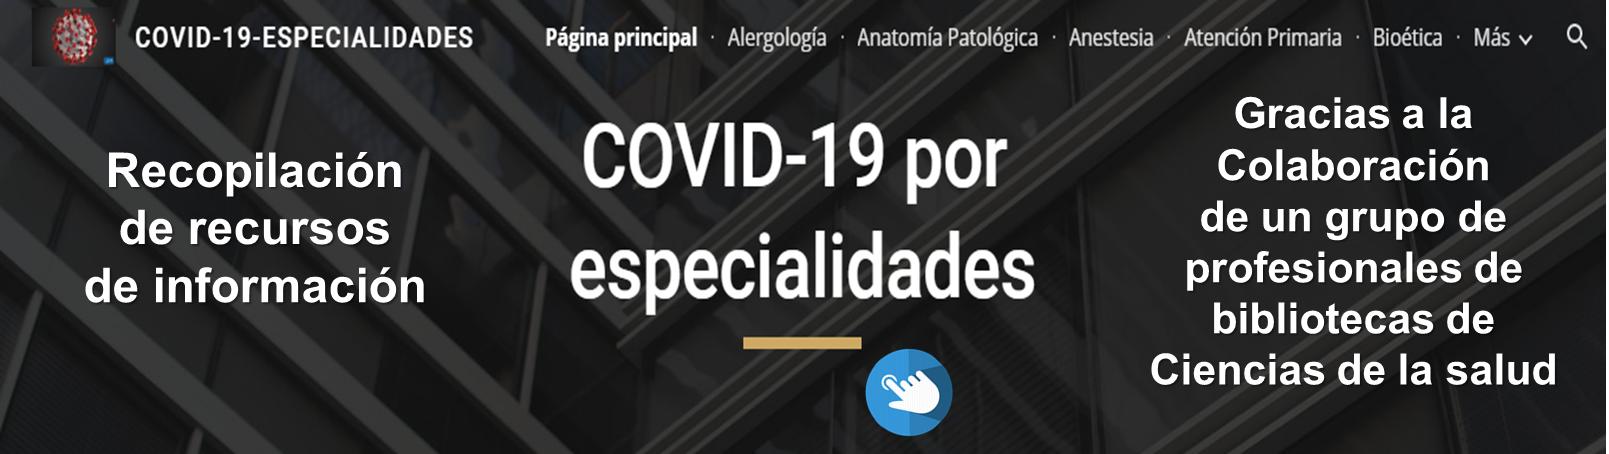 Coronavirus  SARS-COVID19: Recursos por especialidades médicas